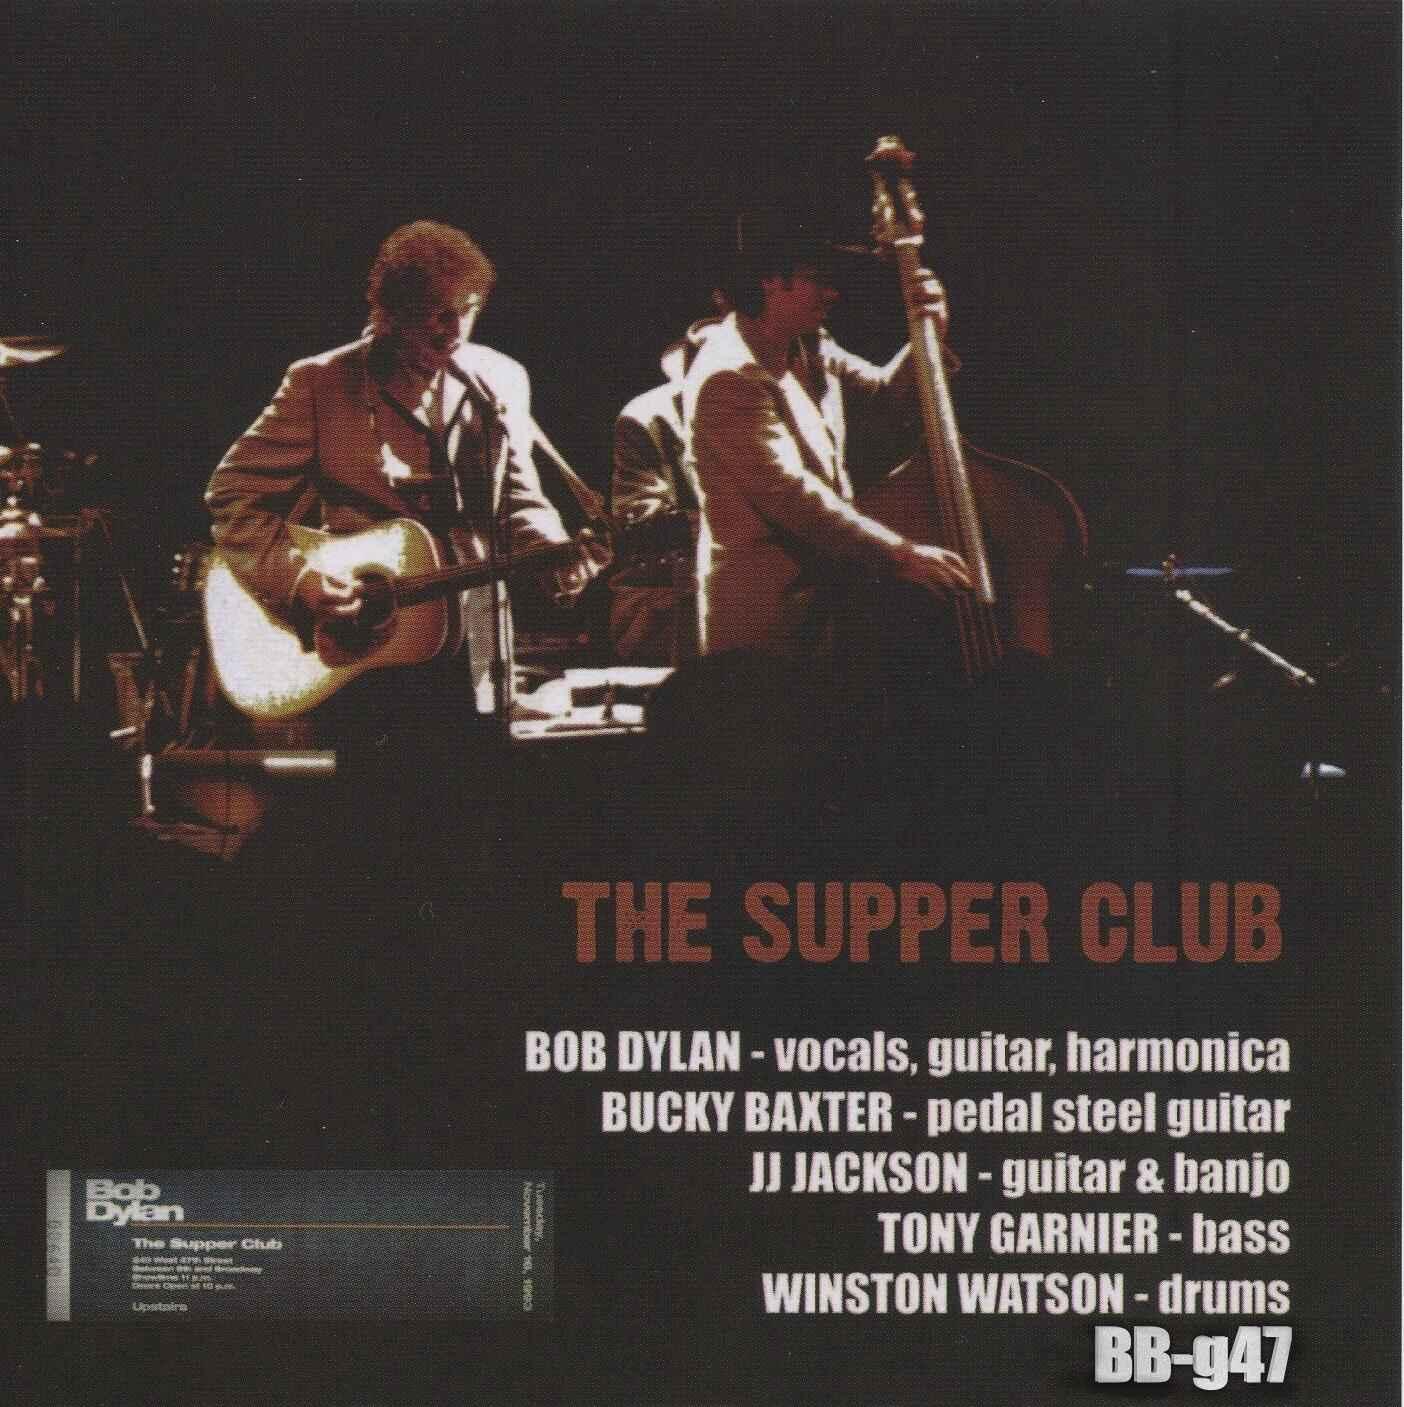 Genuine Supper Club Soundboards 11 17 2nd Bobsboots